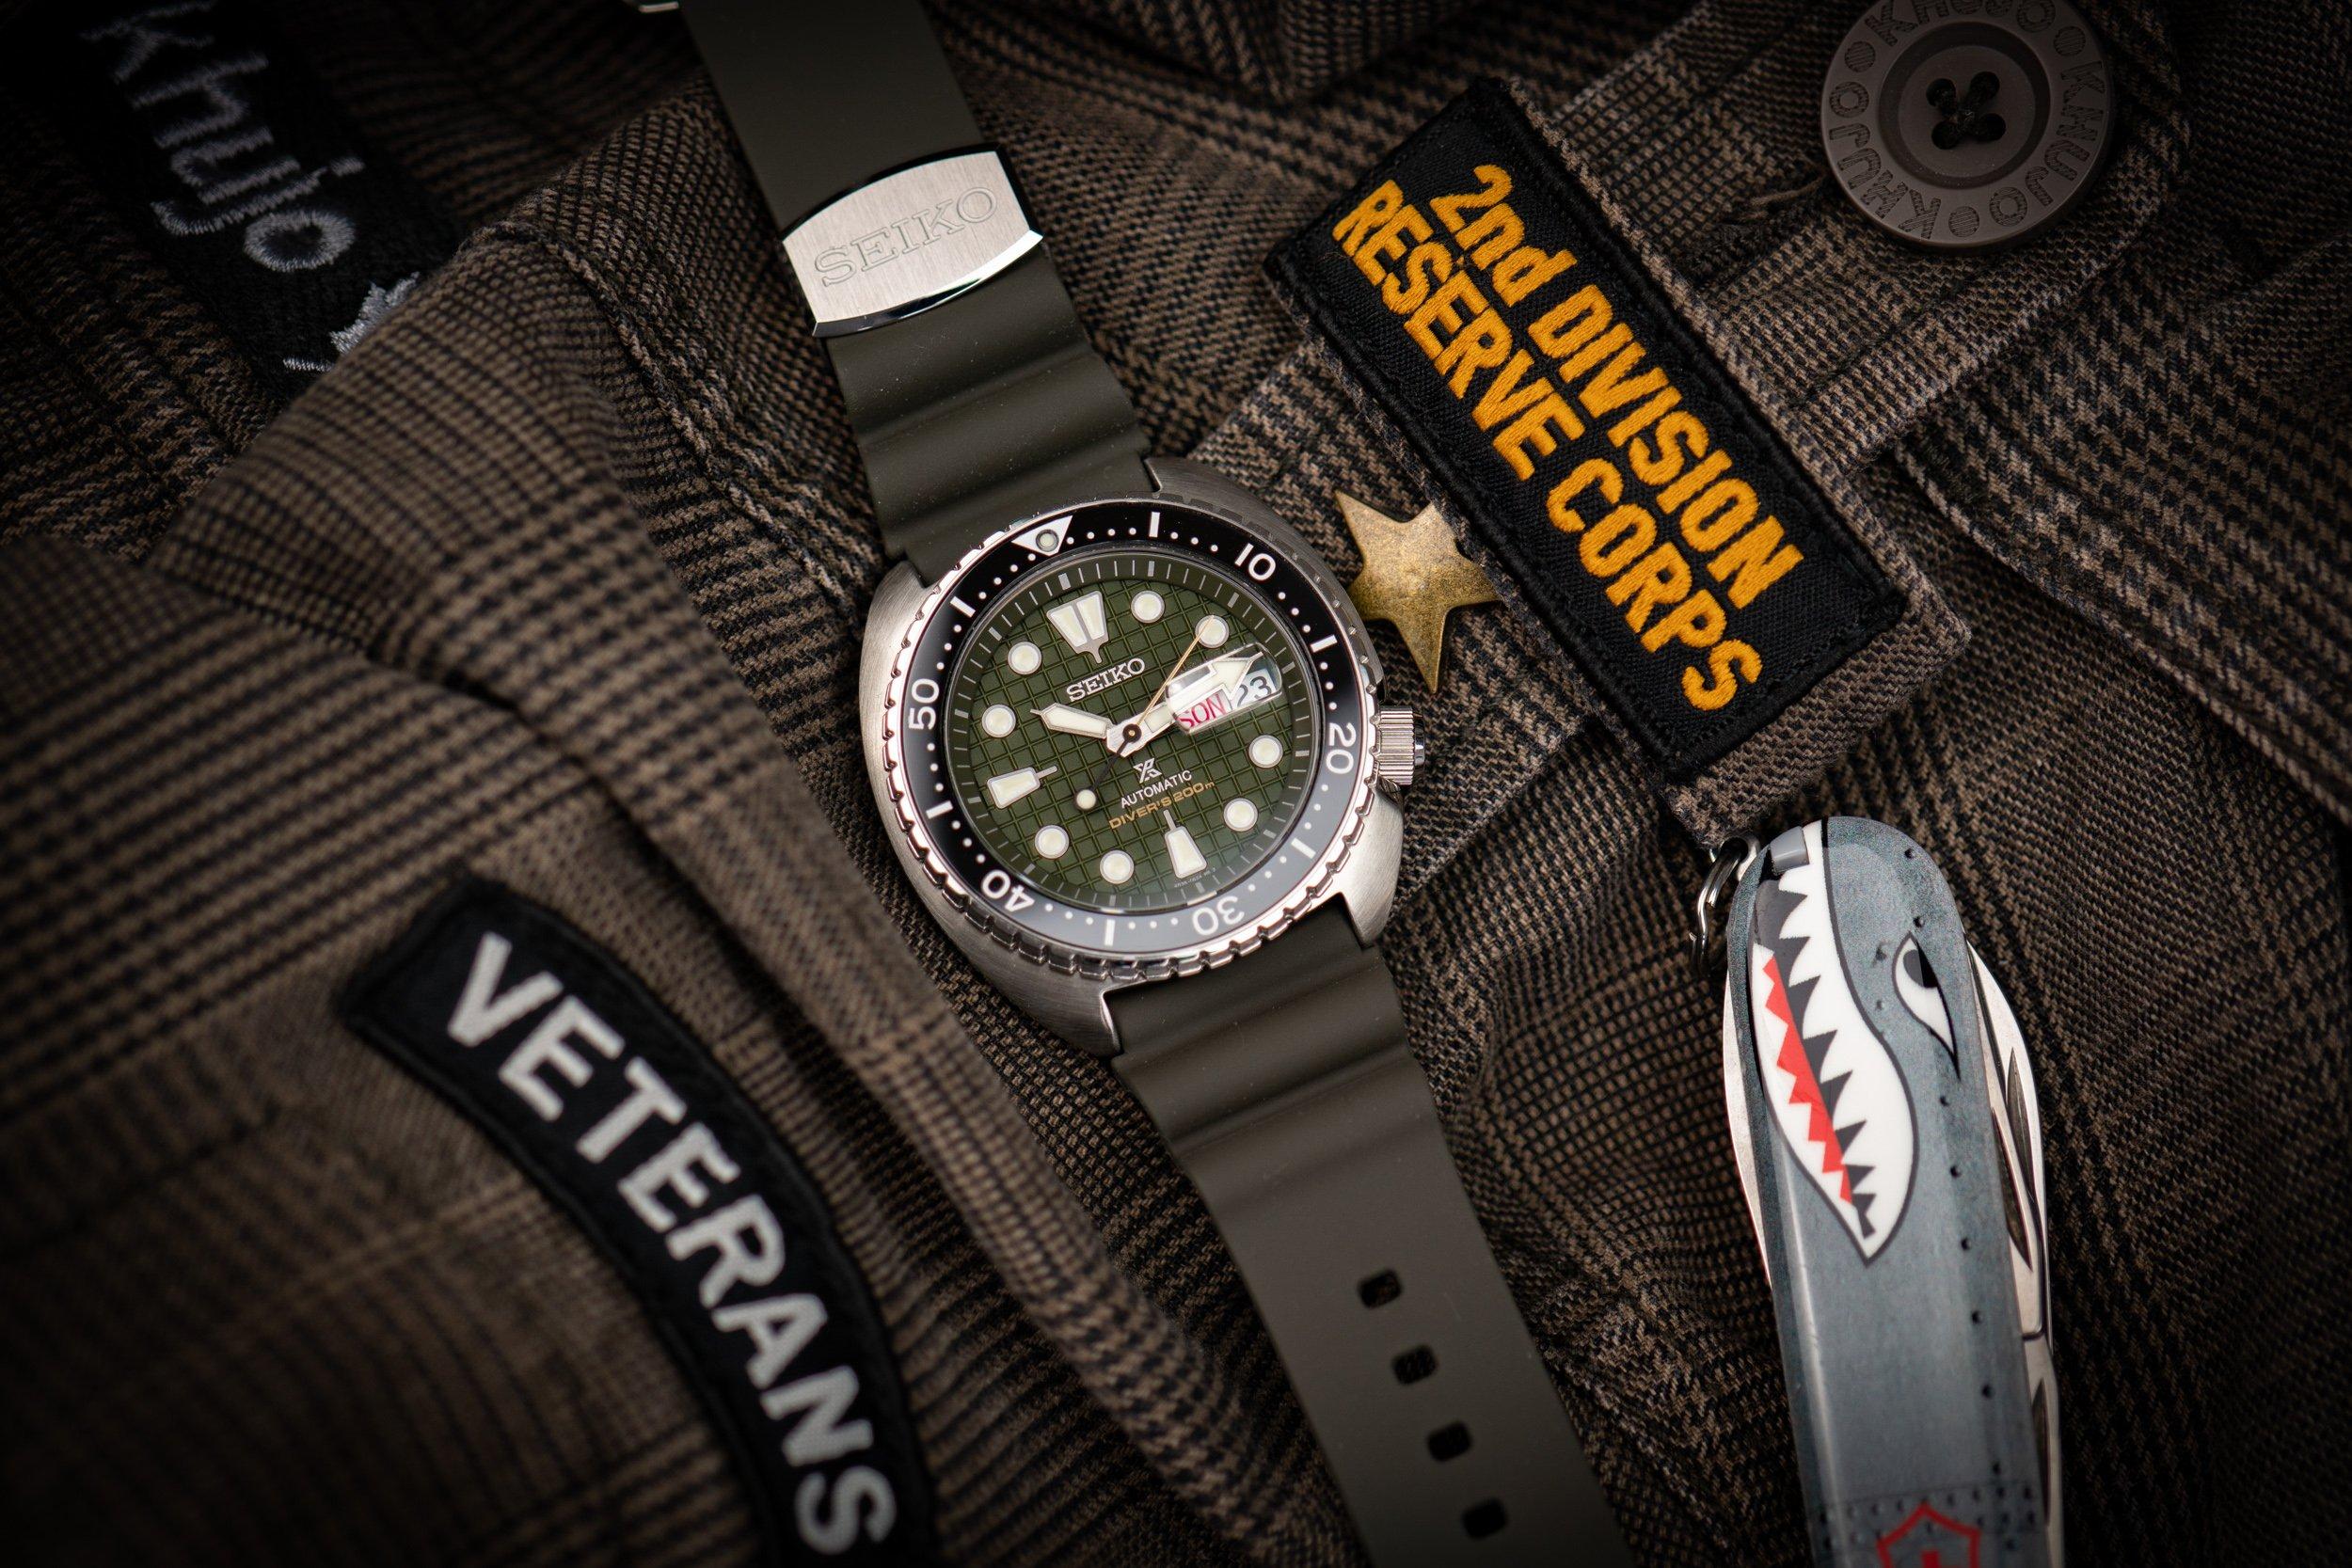 Seiko-Prospex-Diver-200m-King-Turtle-2020-Militäruhr-oliv-grün-Waffelzifferblatt-Test